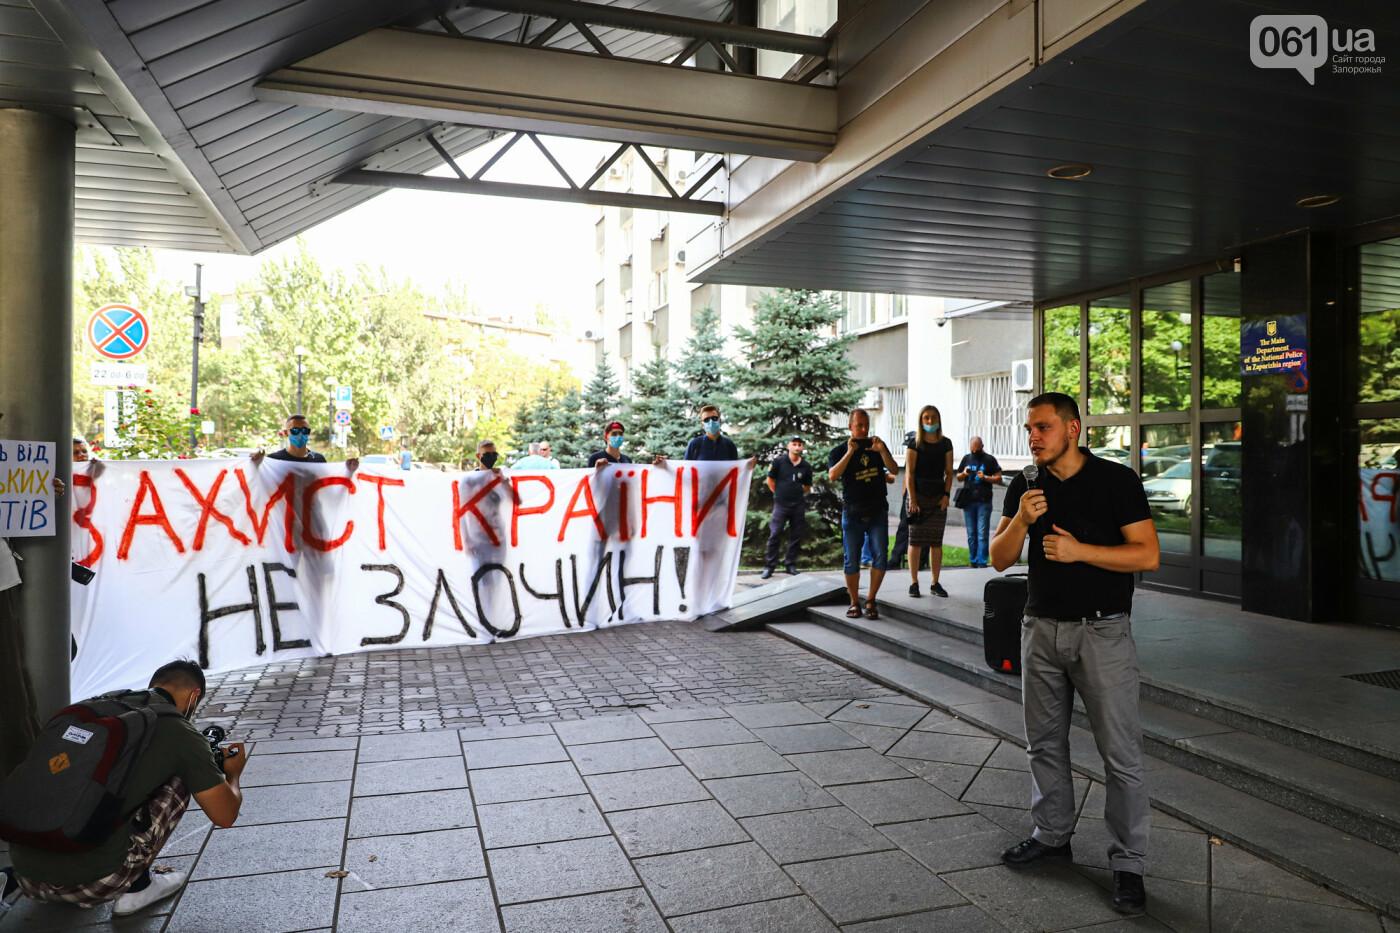 """Захист країни - не злочин"": в Запорожье патриоты провели митинг у стен нацполиции, - ФОТОРЕПОРТАЖ , фото-1"